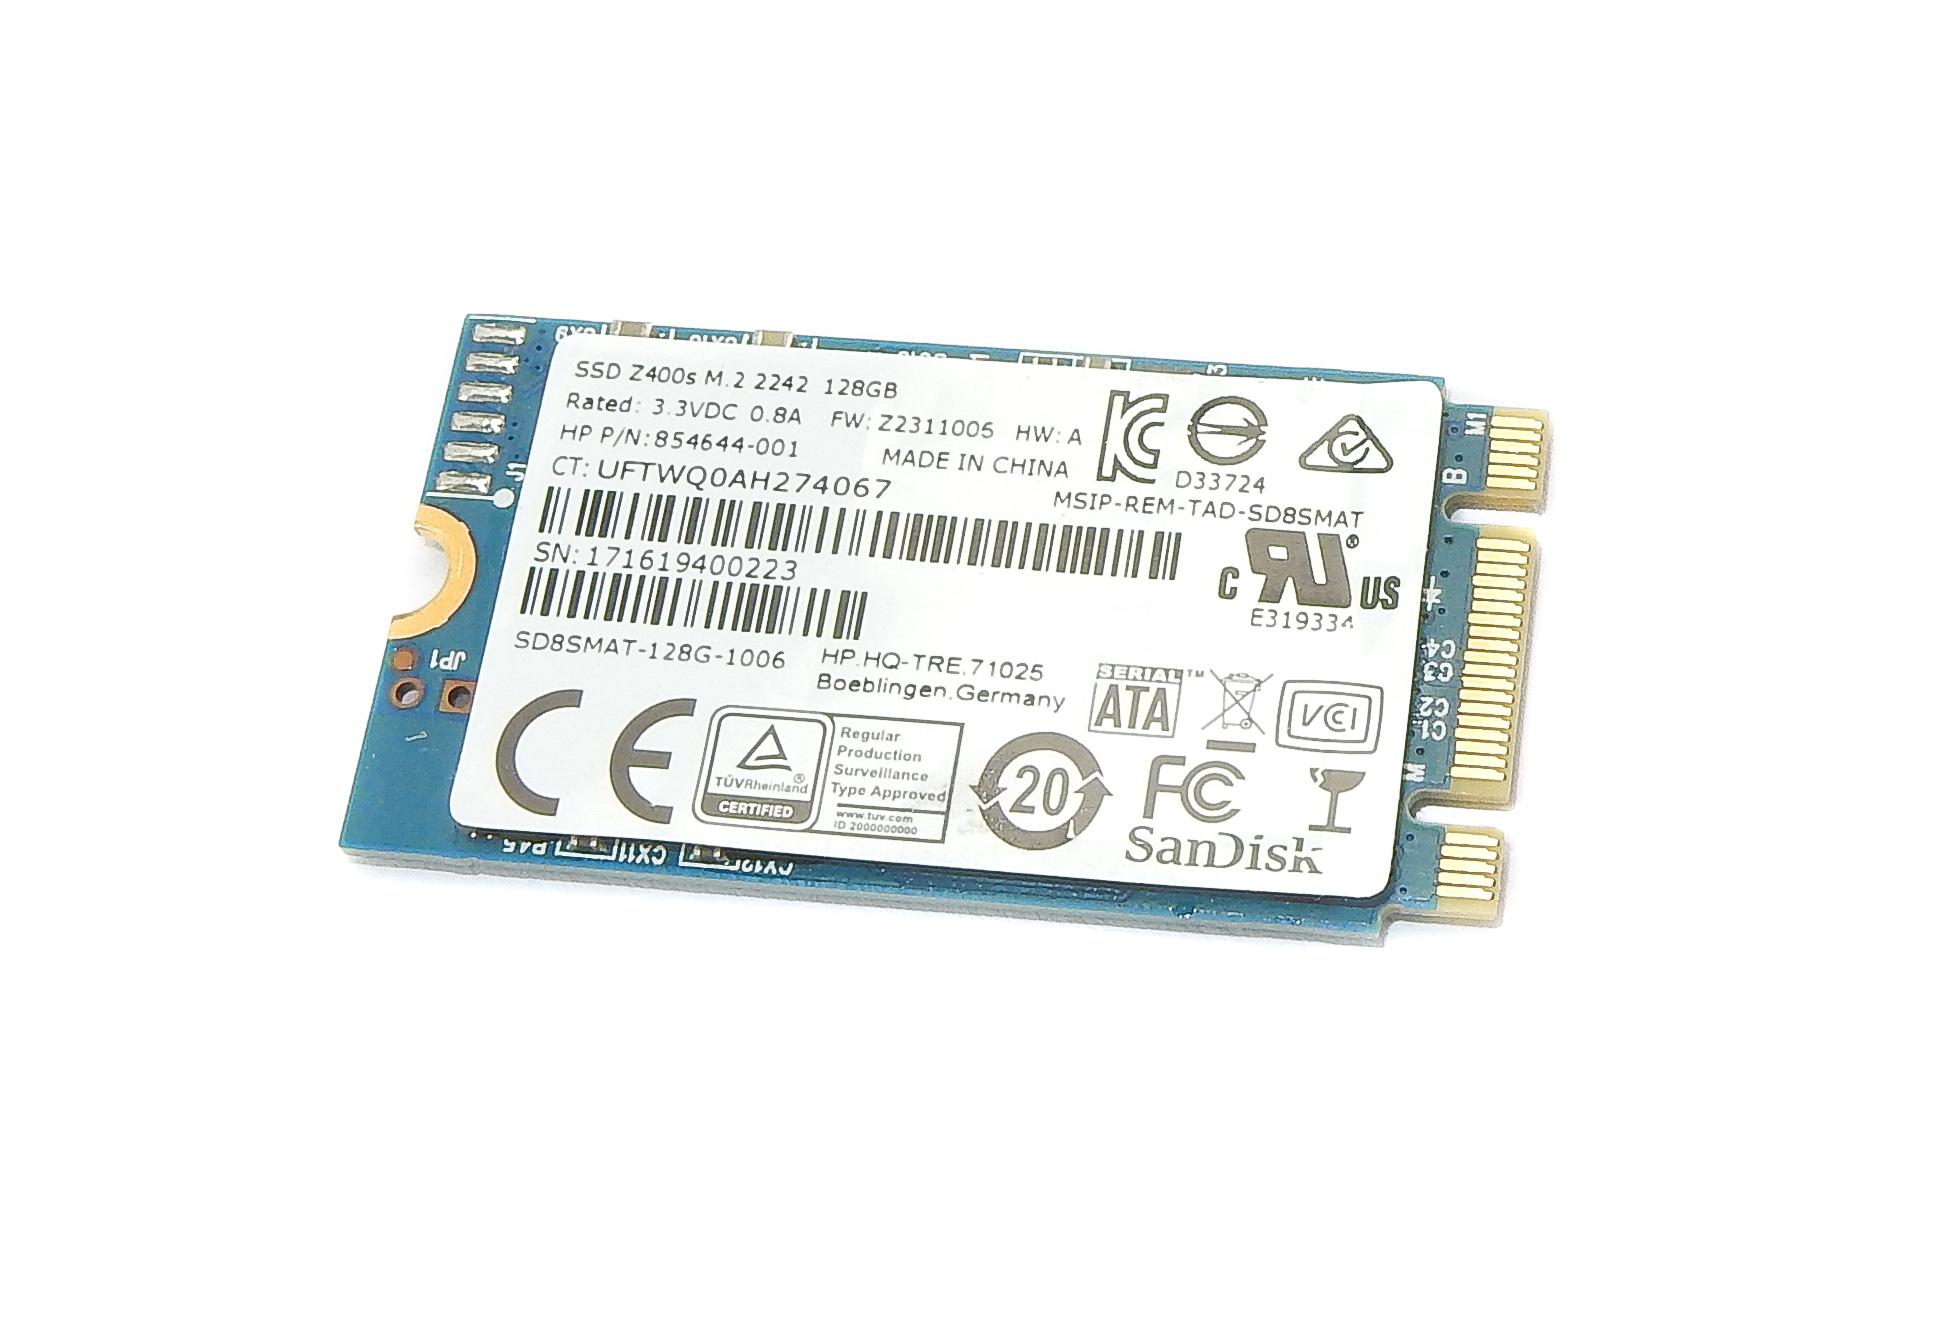 HP 854644-001 SanDisk SD8SMAT-128G-1006 128GB Z400s SATA M.2 2242 SSD